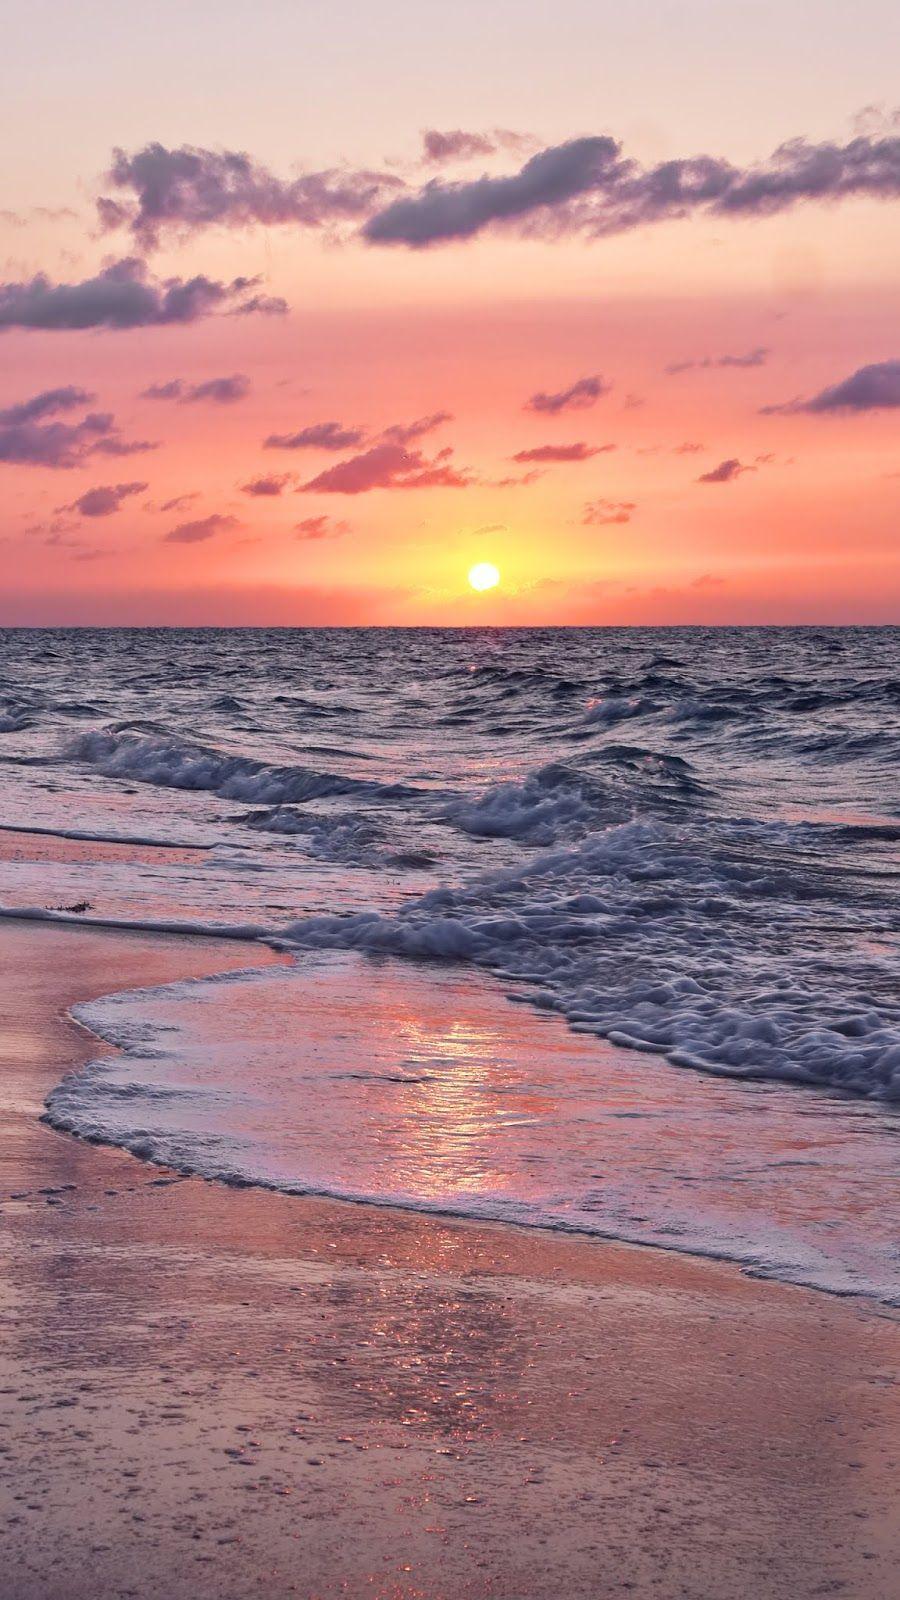 Stunning Sunset Sky Great Pretty Wallpapers Pretty Skygreat Stunning Sunset Wallpapers Beach Sunset Wallpaper Sunset Wallpaper Wallpaper Iphone Summer